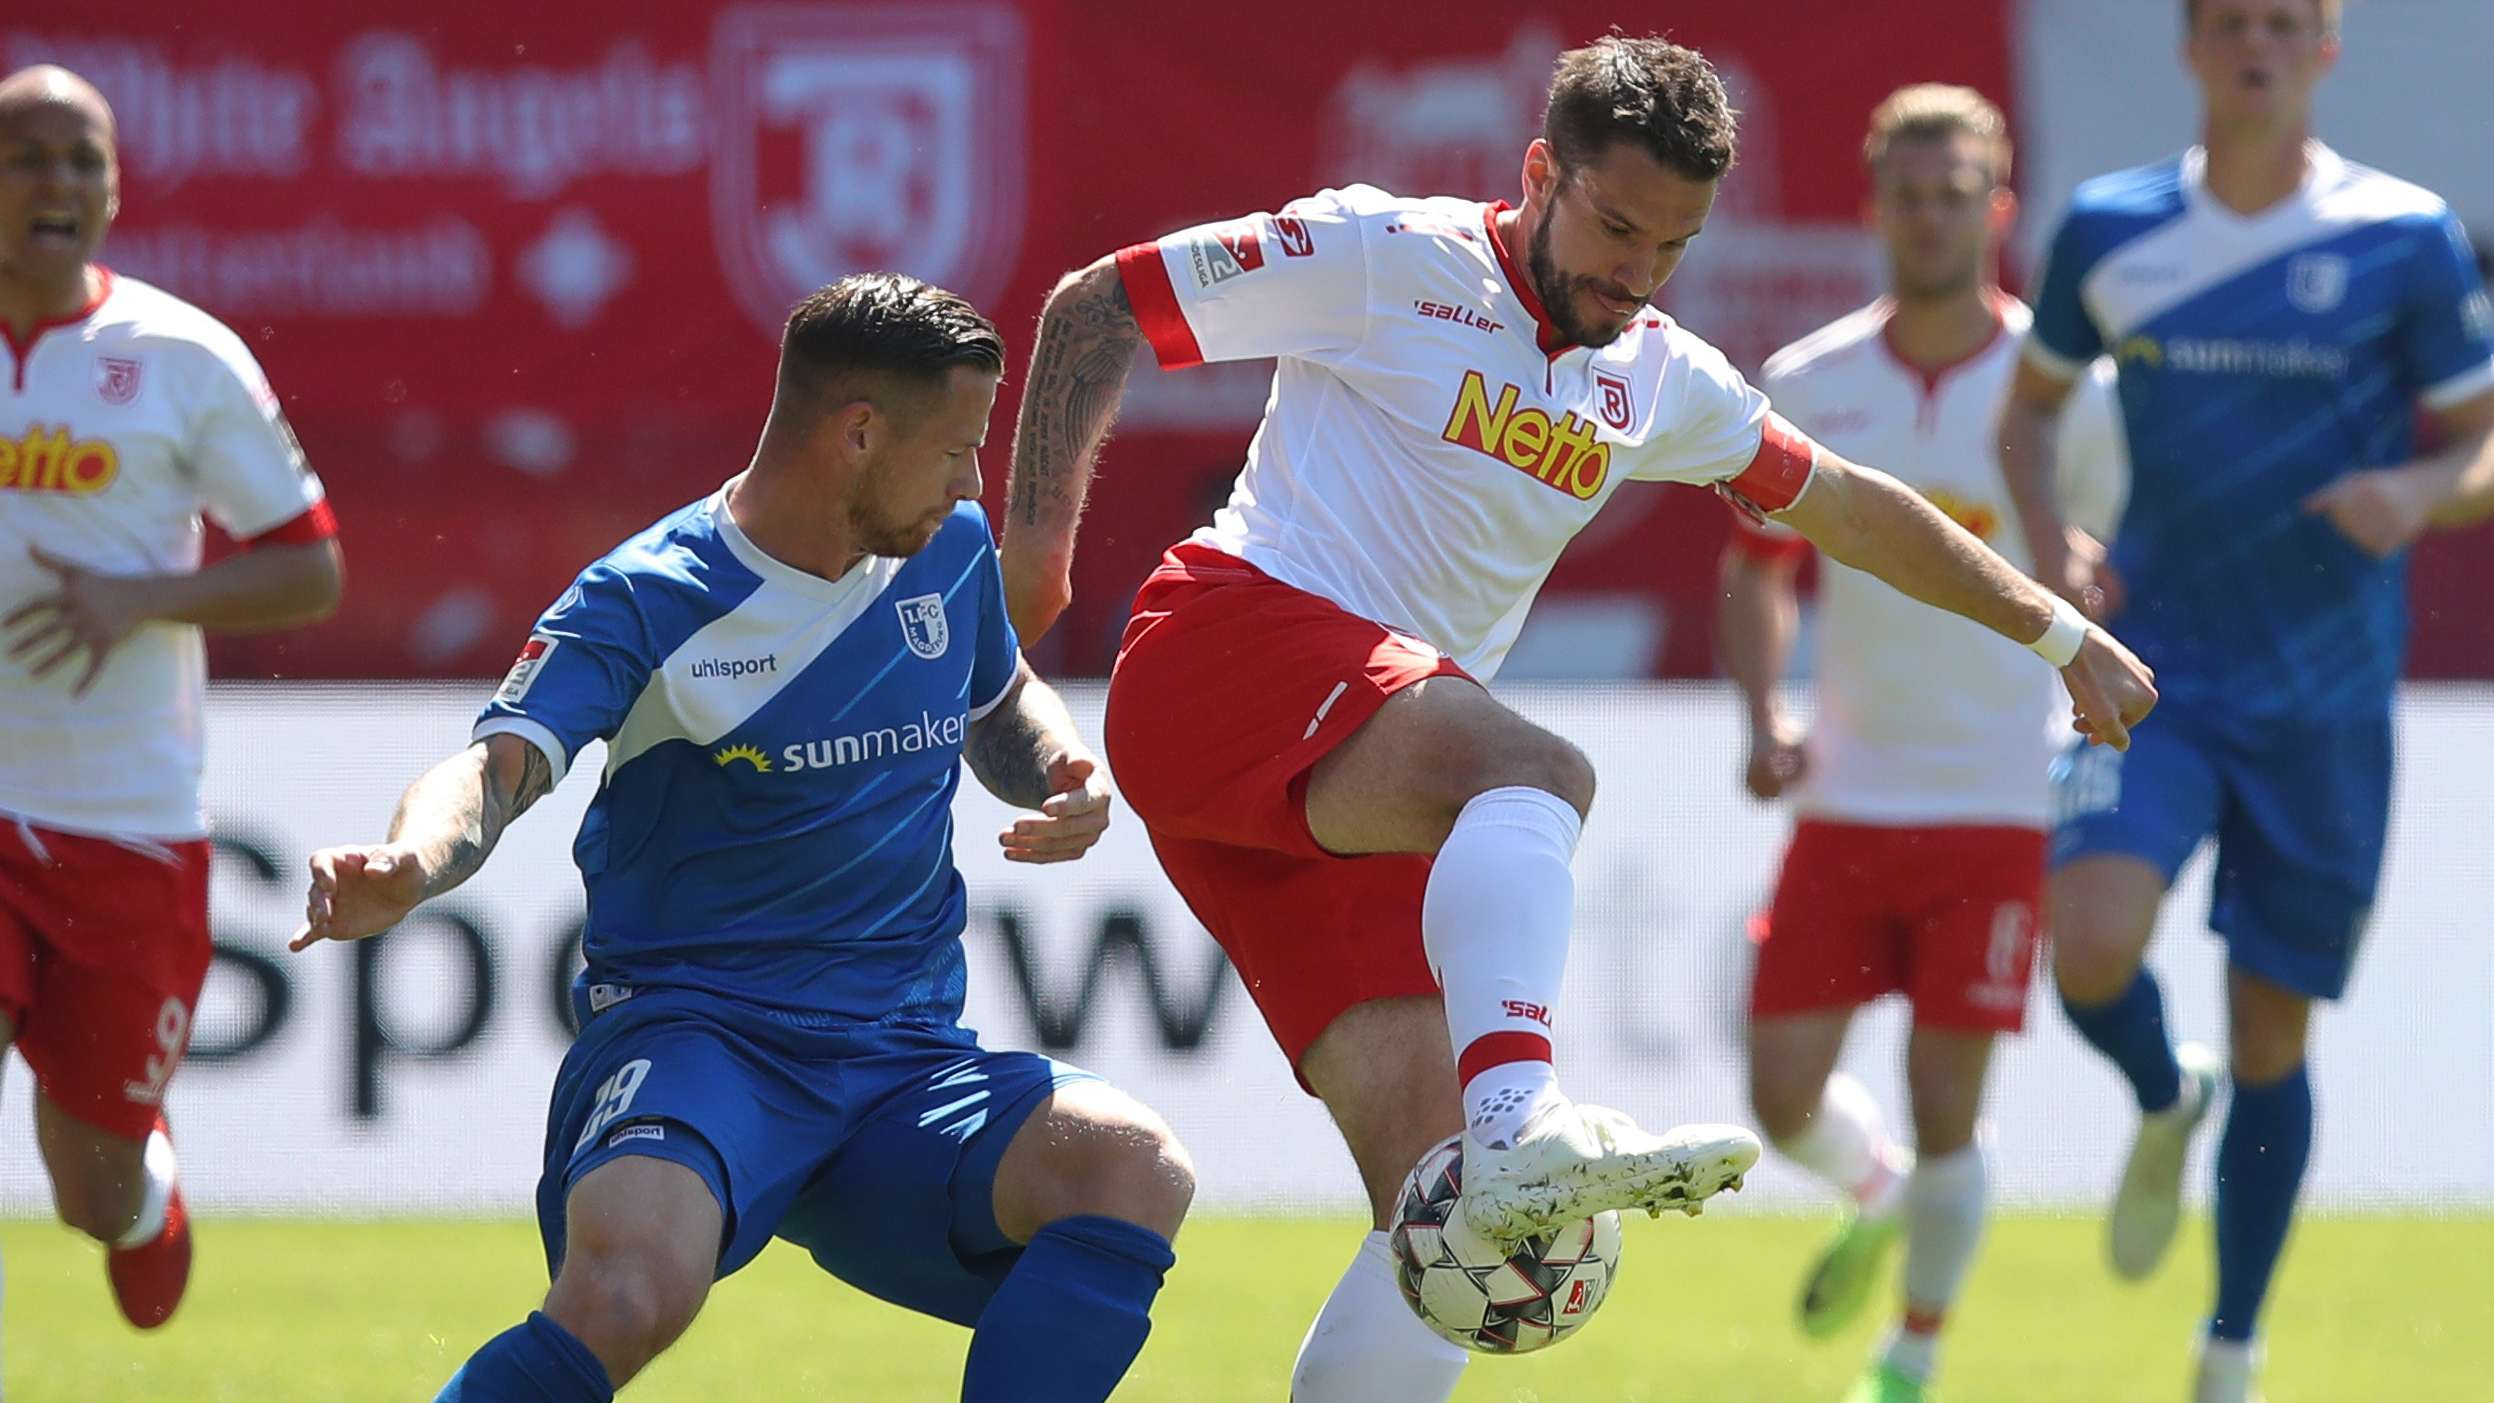 Spielszene Jahn Regensburg - 1. FC Magdeburg